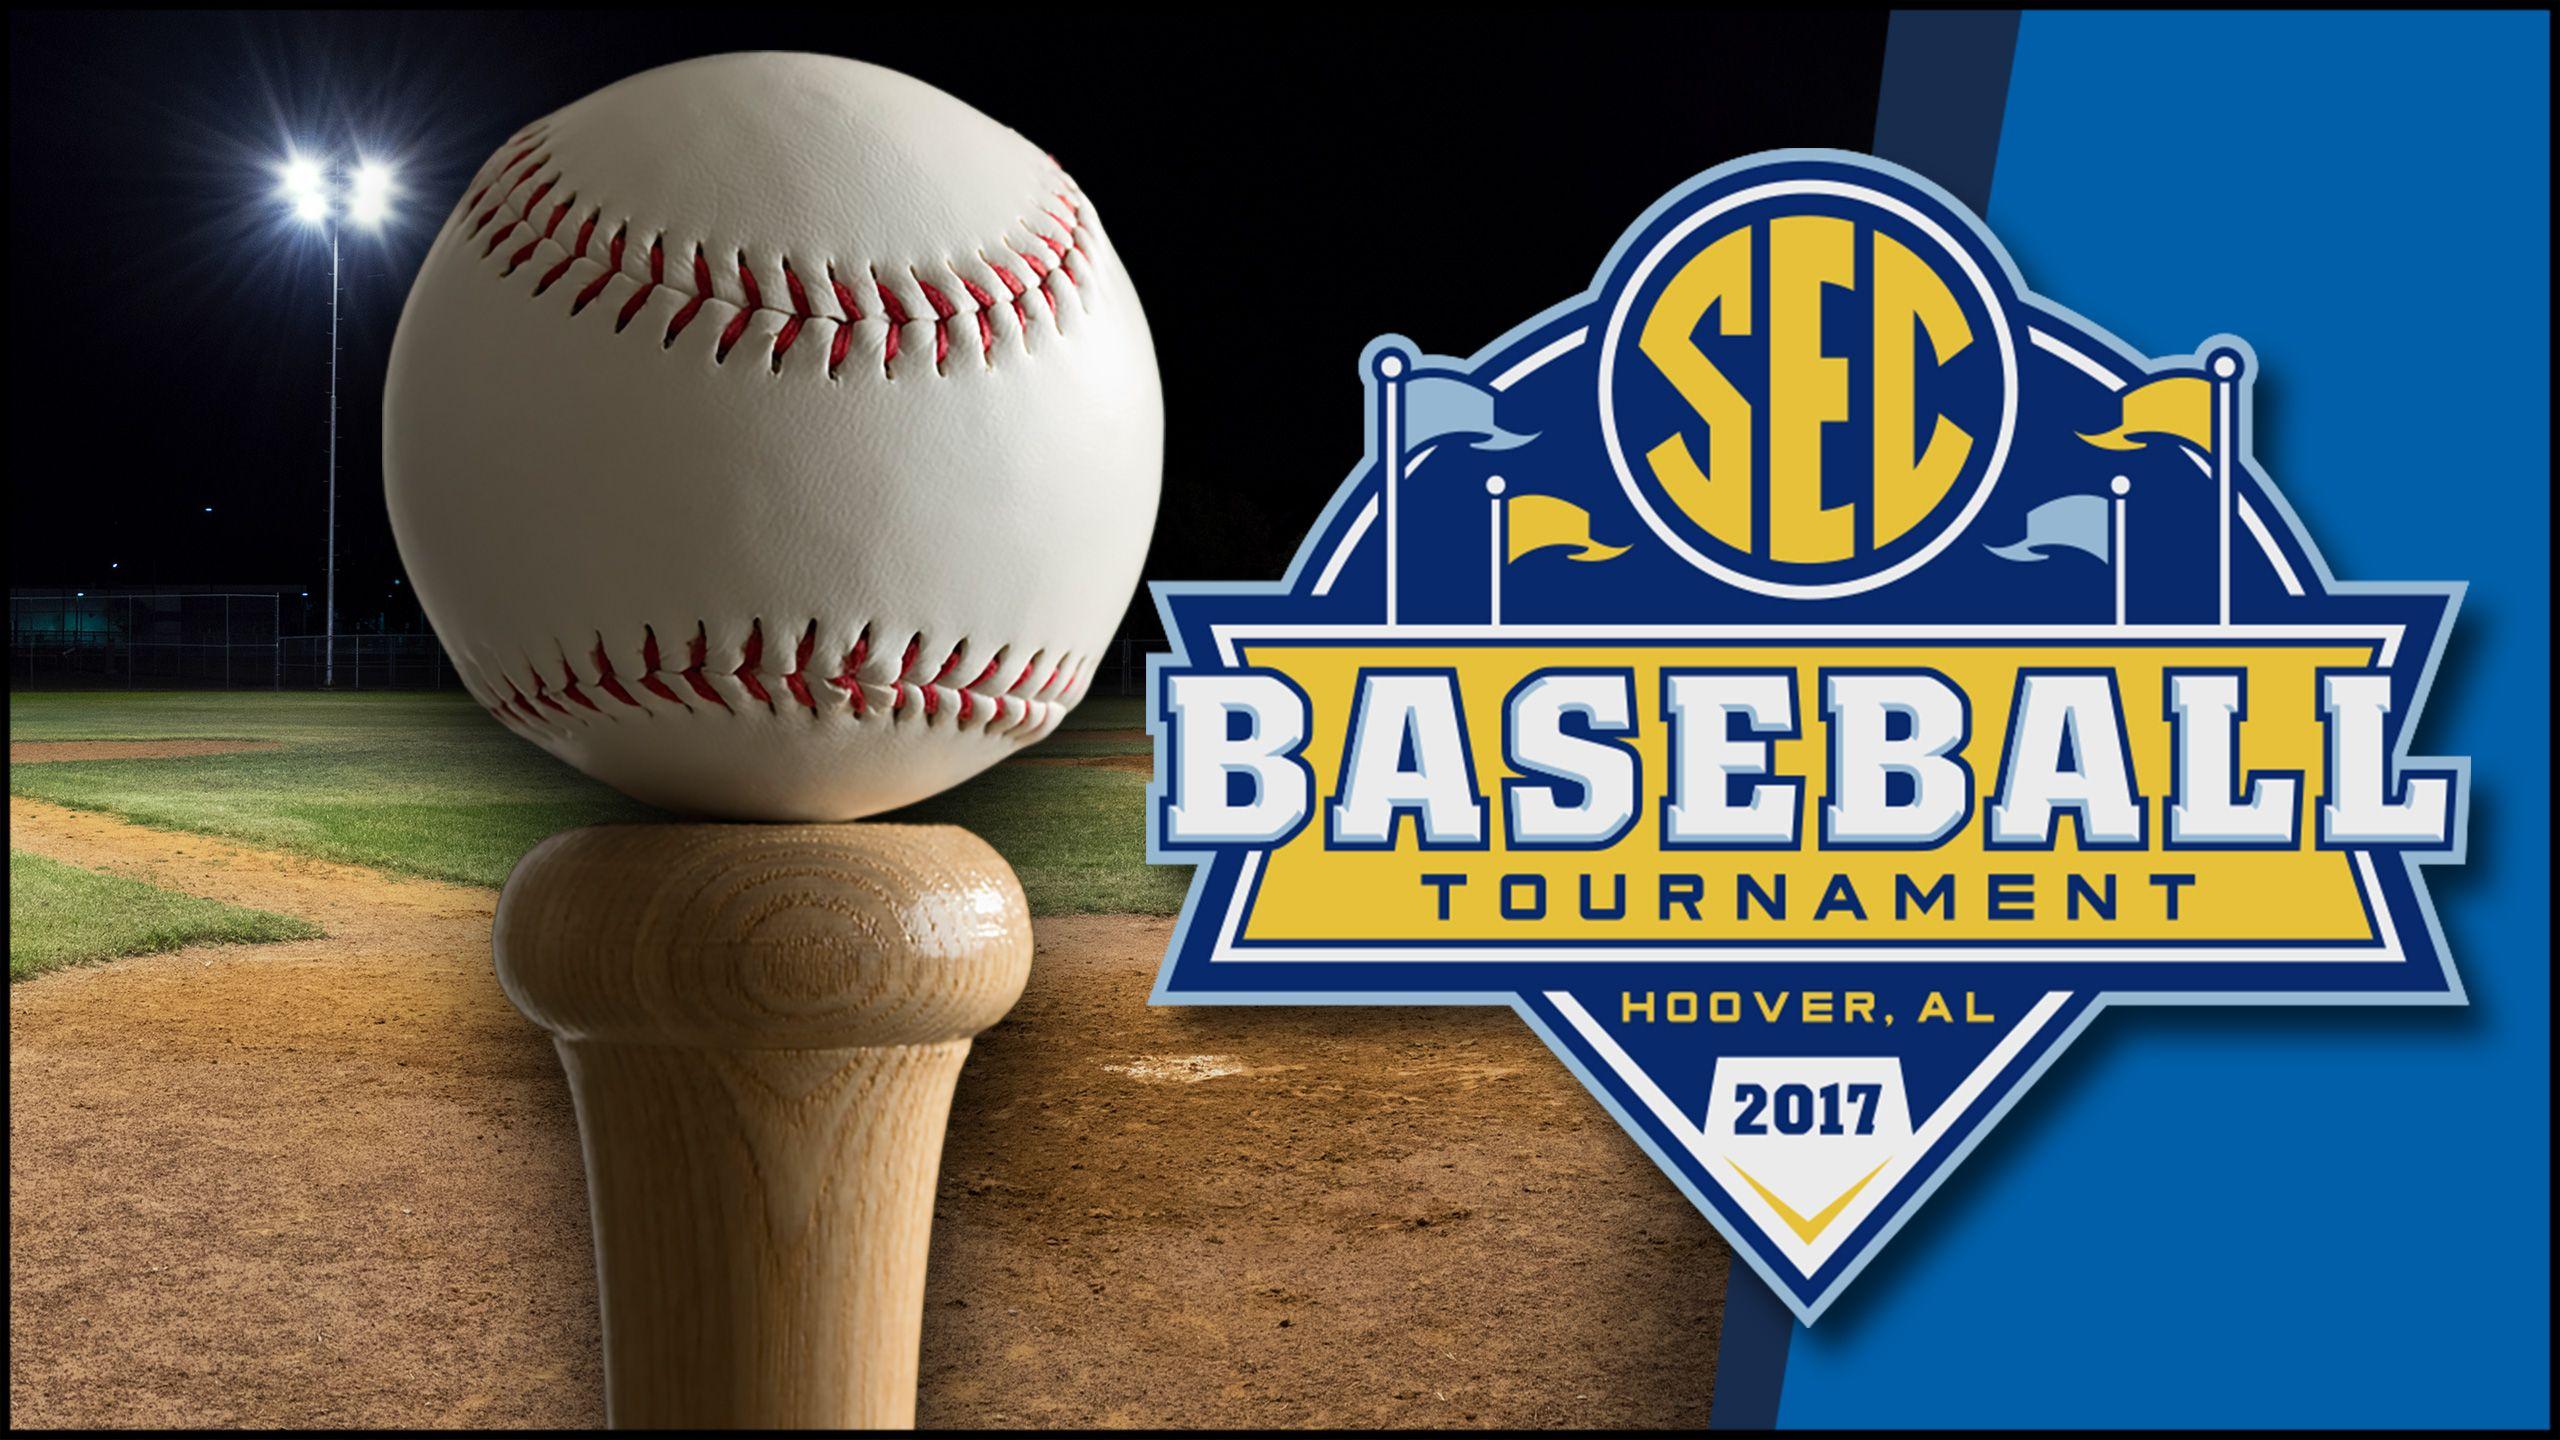 SEC Baseball Championship Press Conference